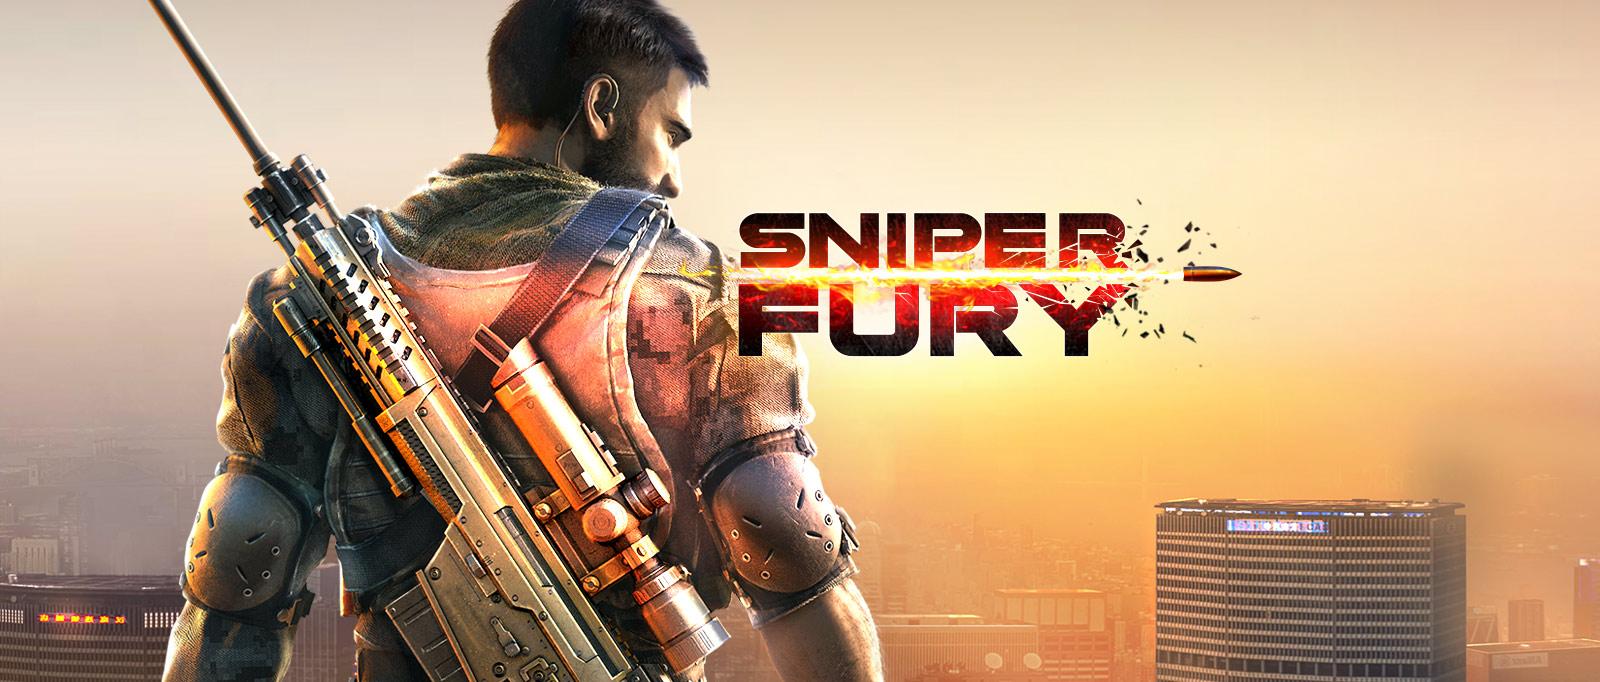 Sniper Fury: ¡Dispara tu Arma!